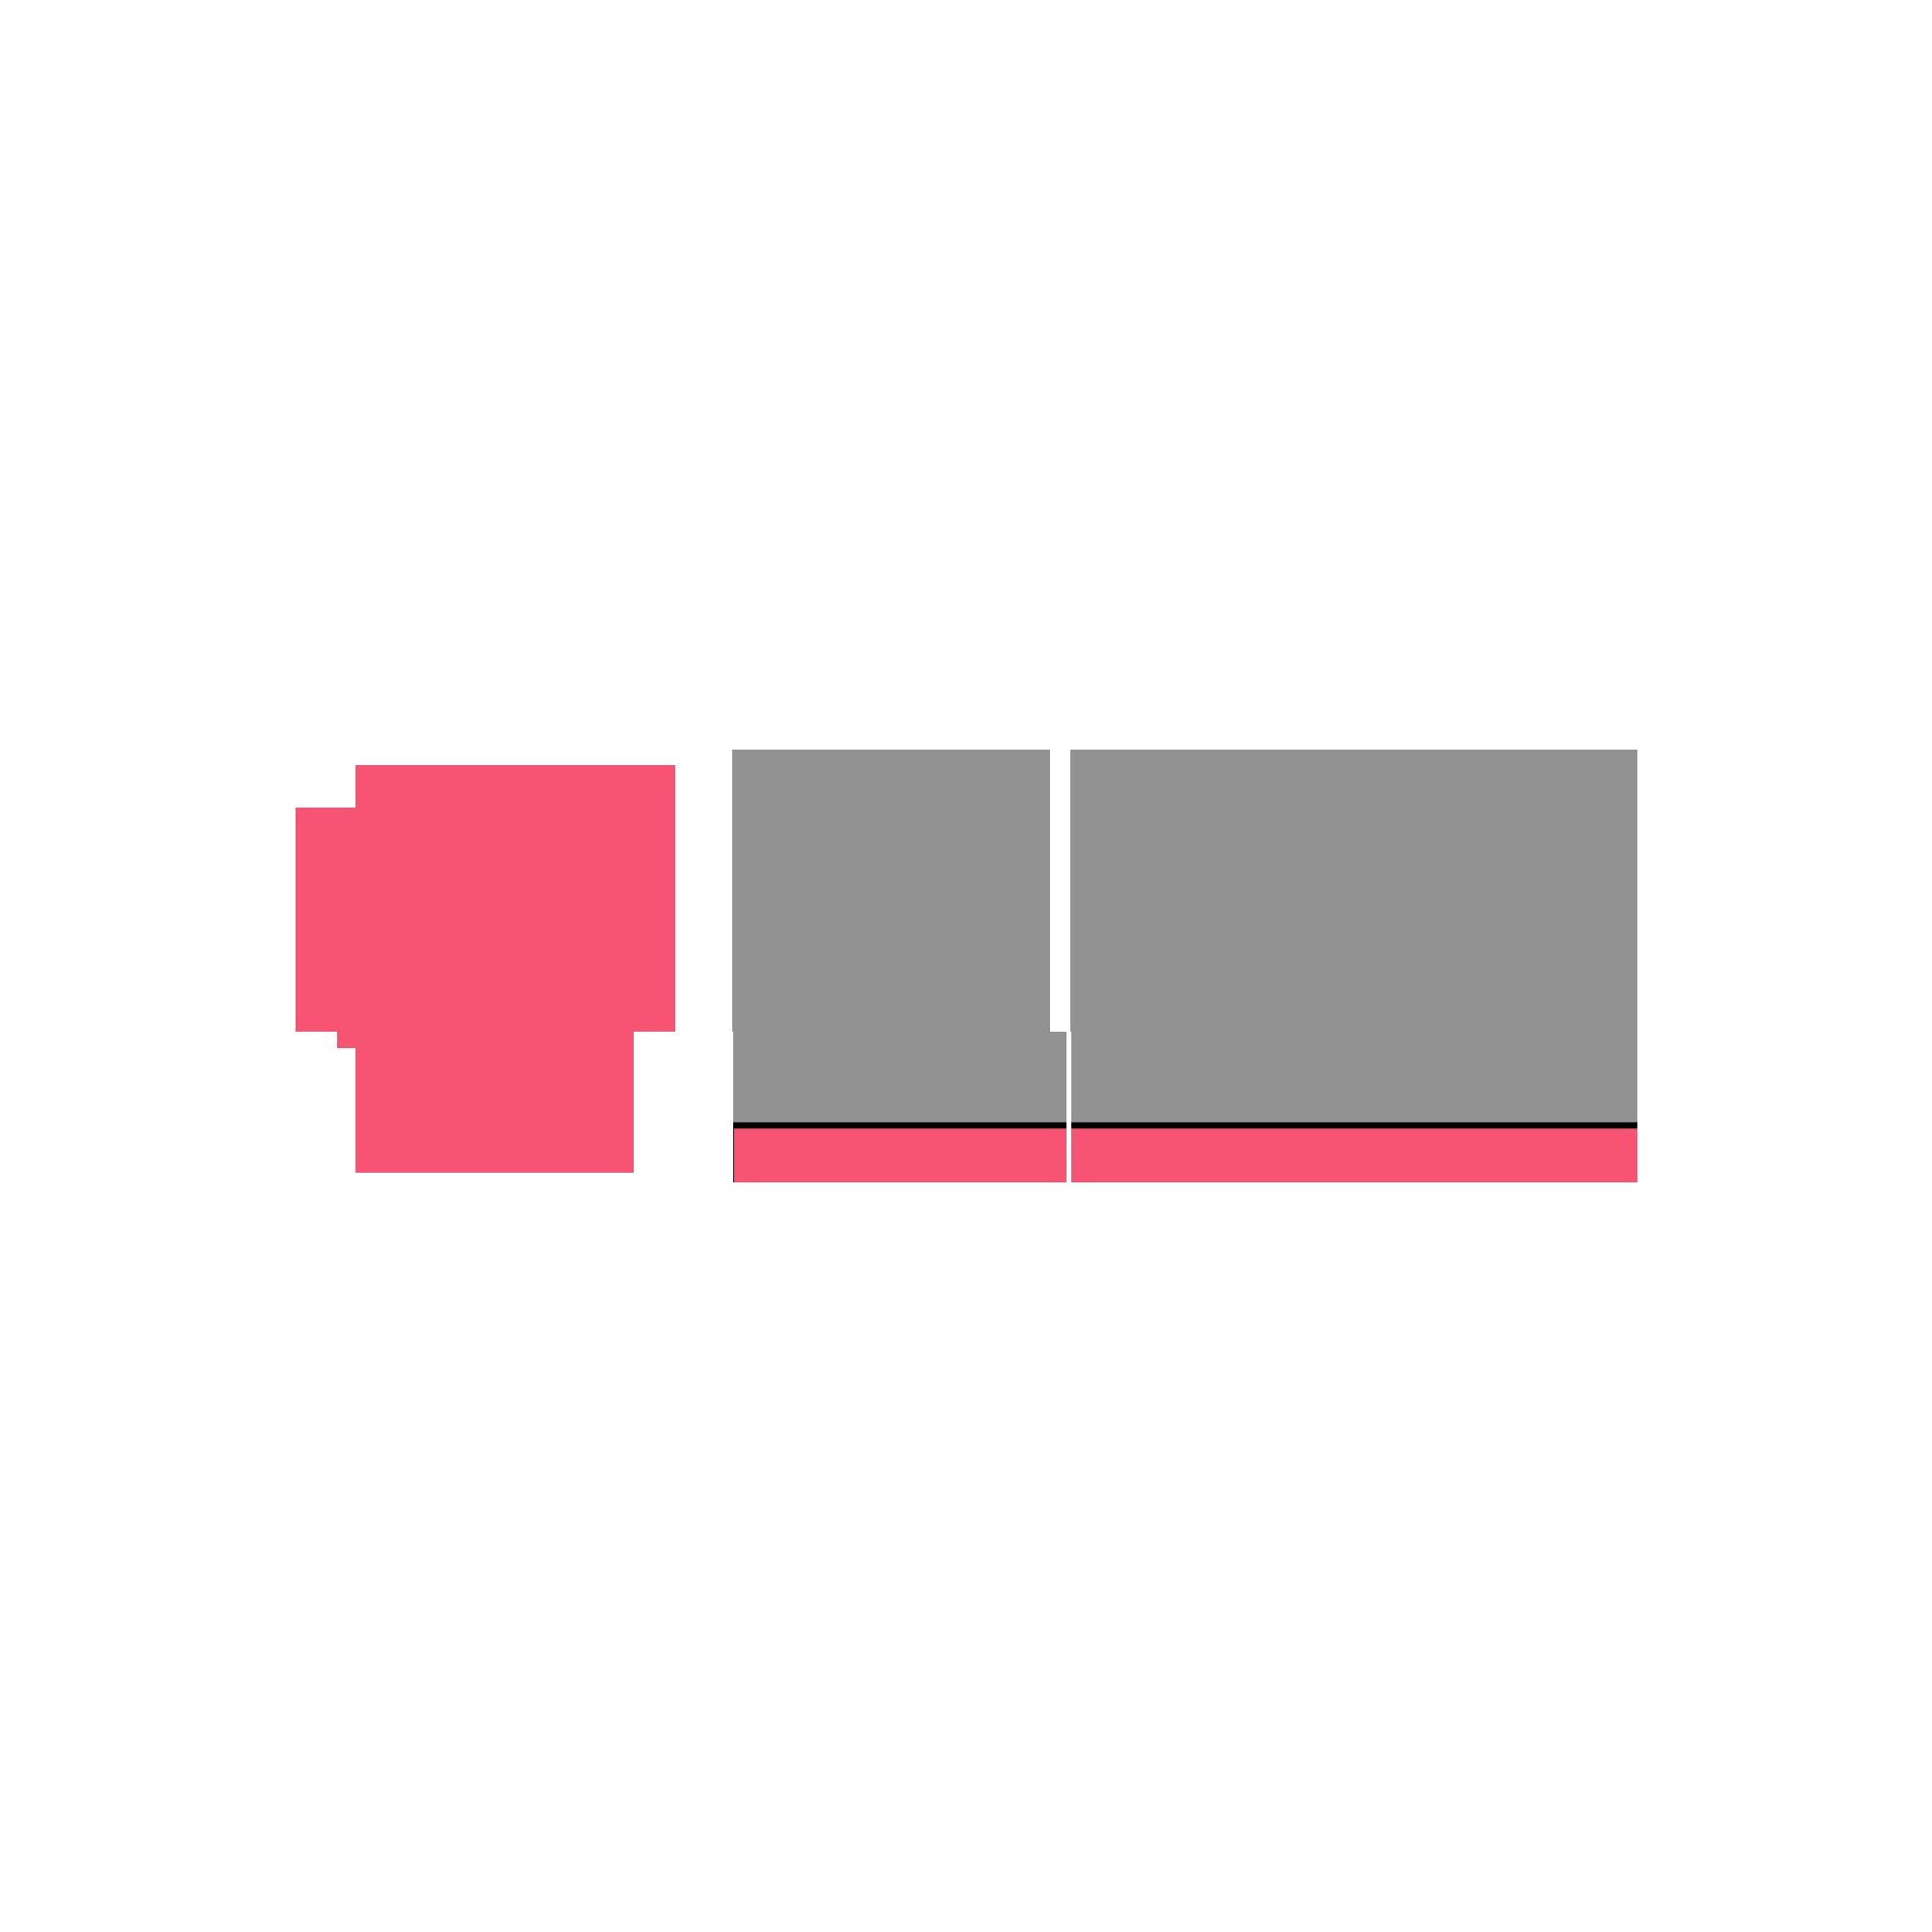 LOGO EDIANEZ CHUEIRI 2019